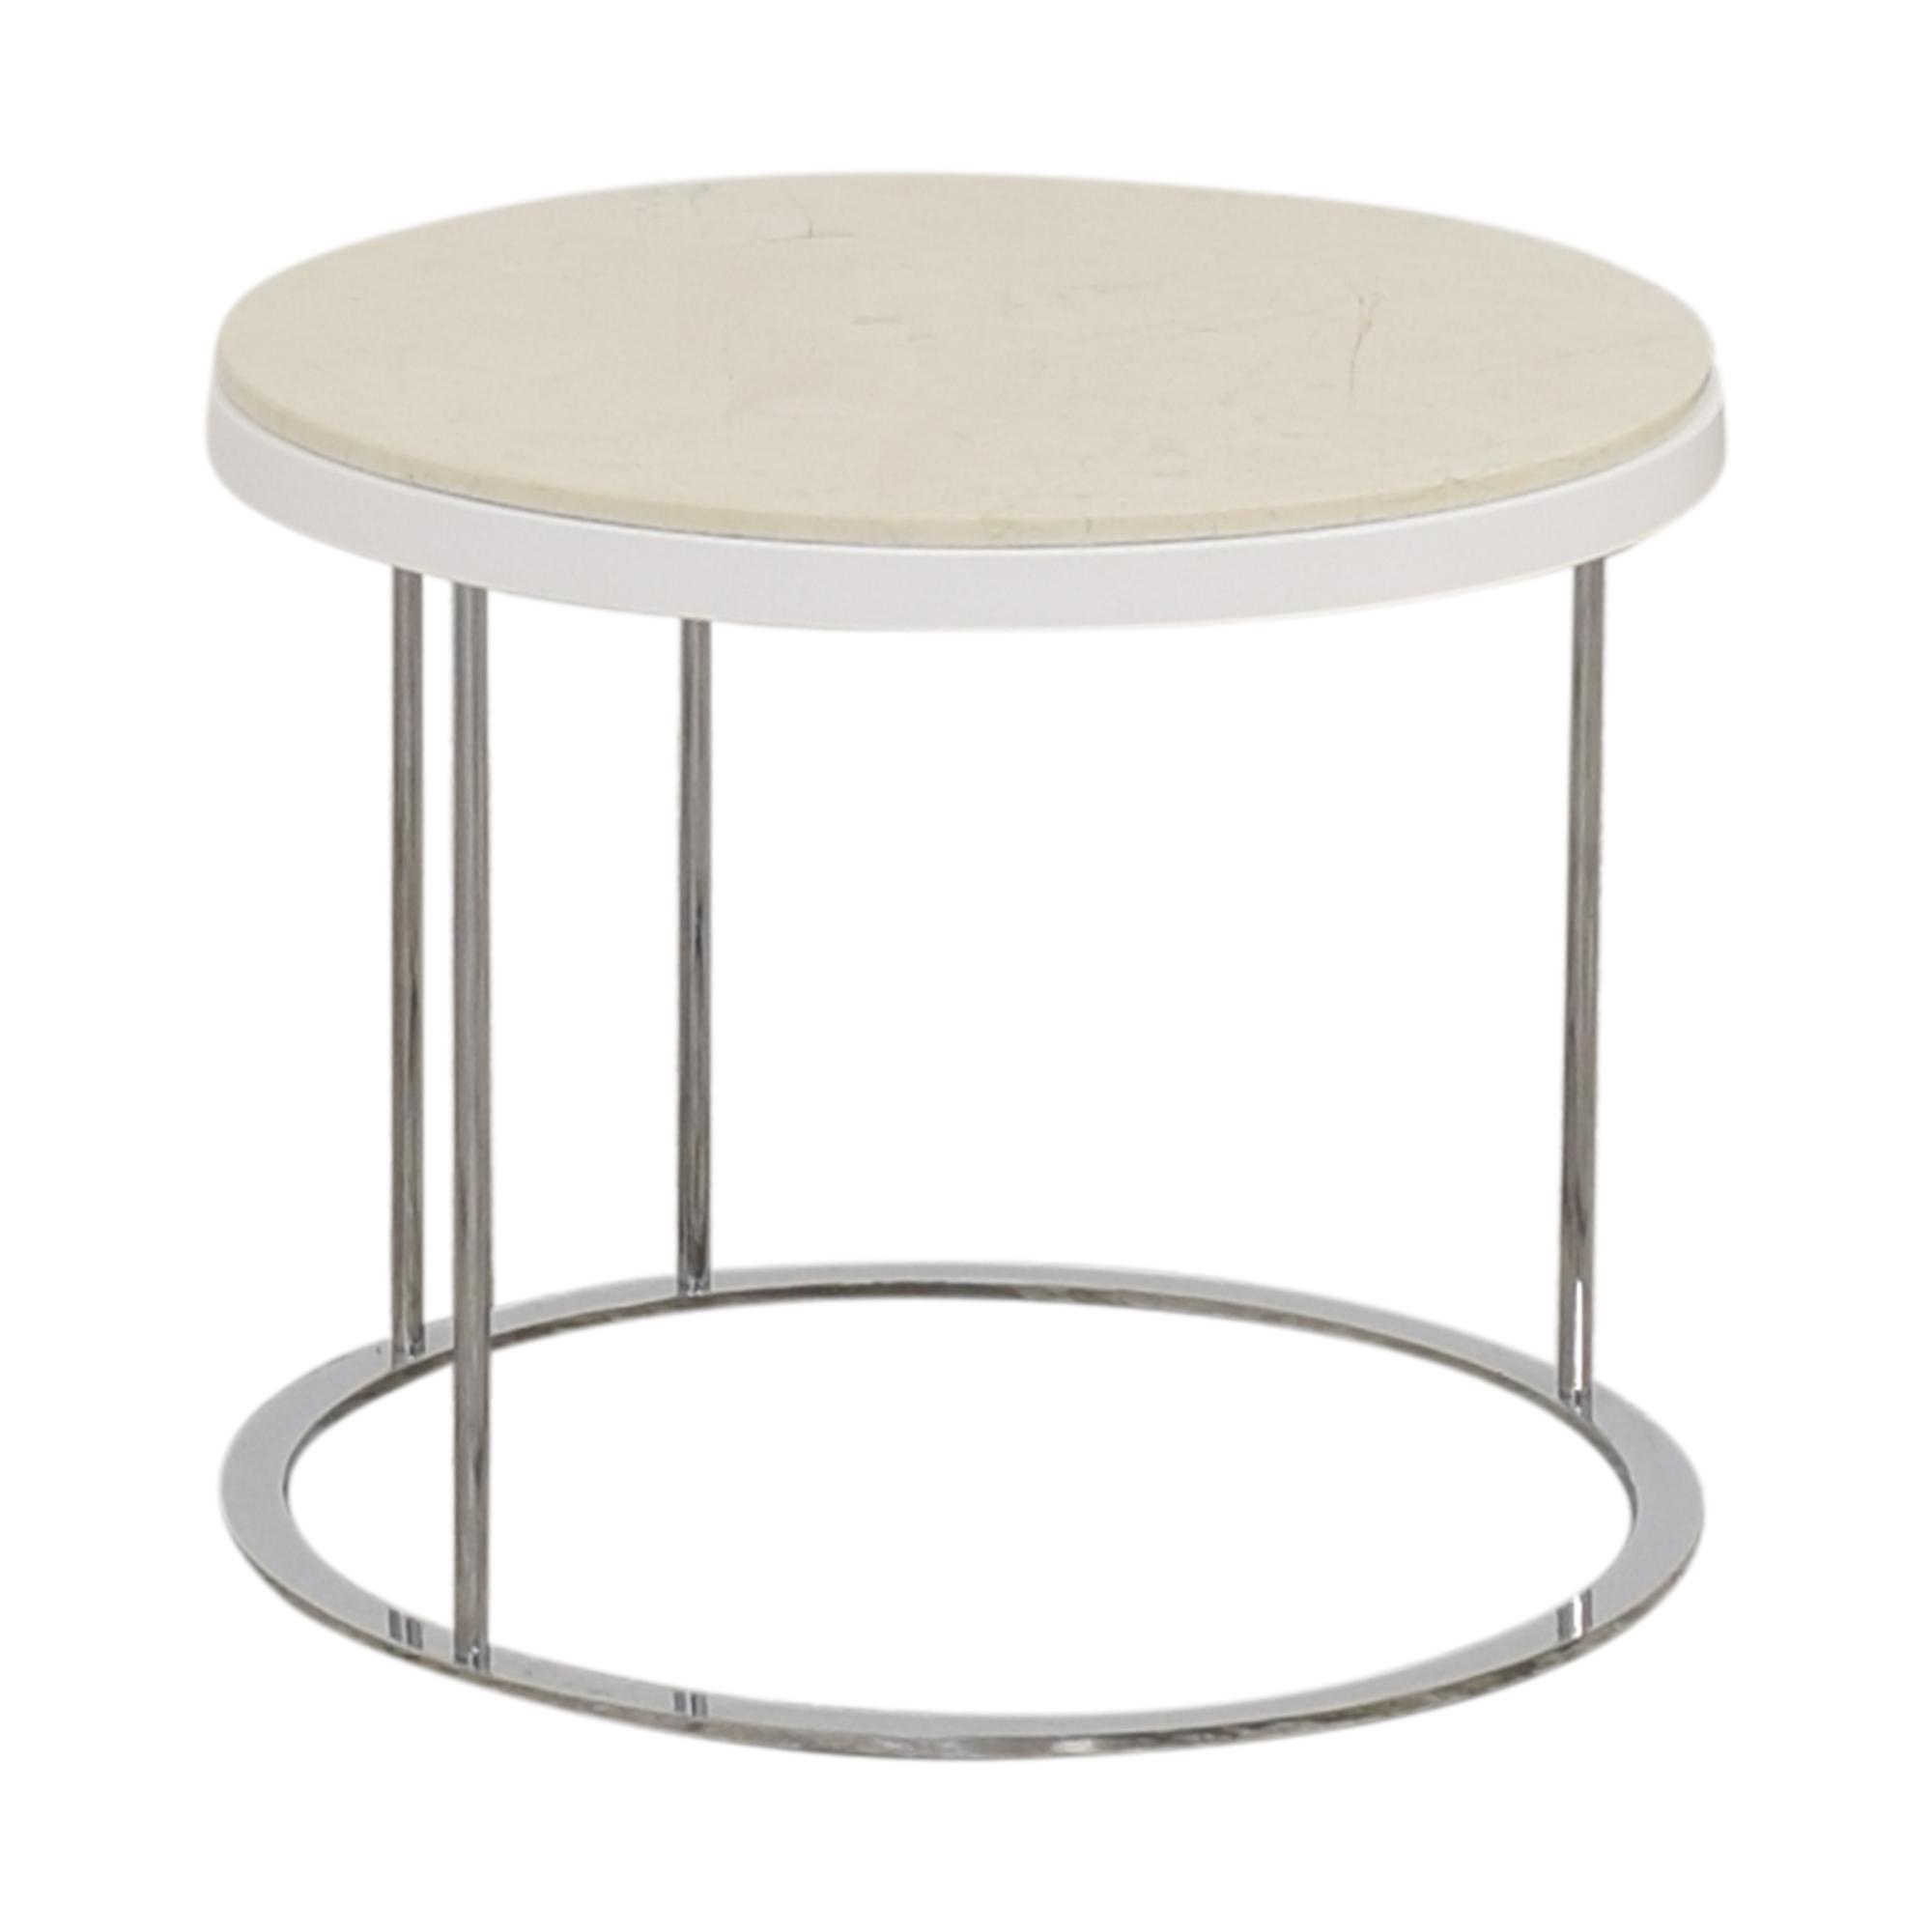 Koleksiyon Perrino End Table / Tables